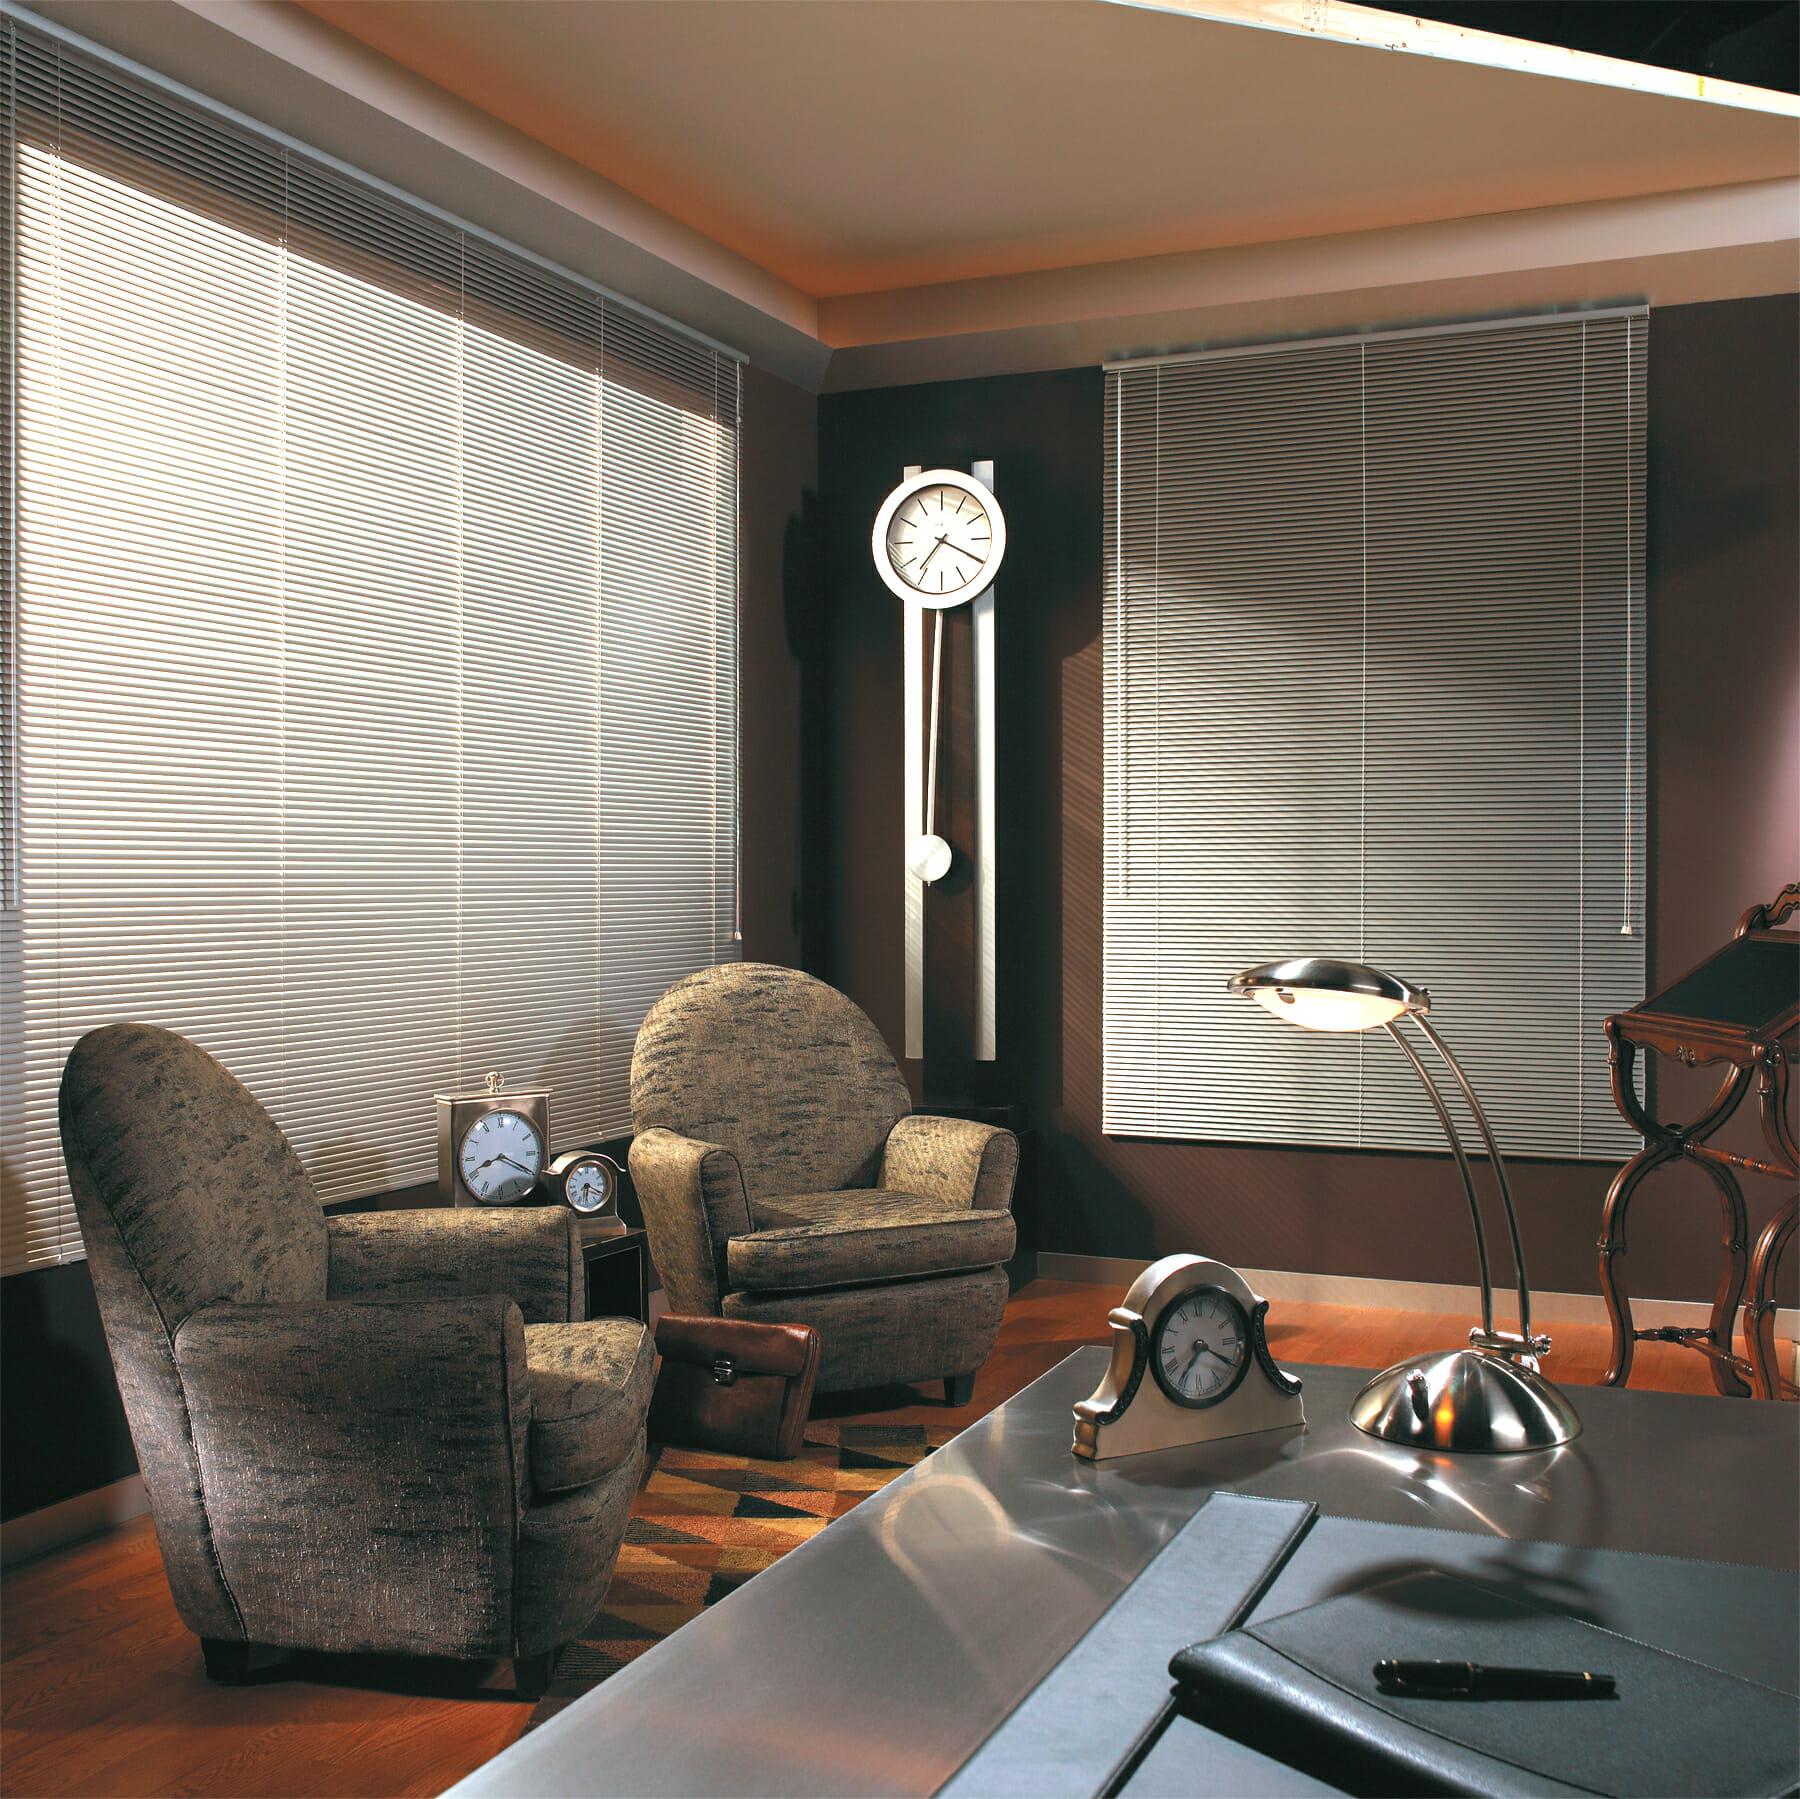 wonderful how to clean aluminum blinds Part - 14: wonderful how to clean aluminum blinds good ideas